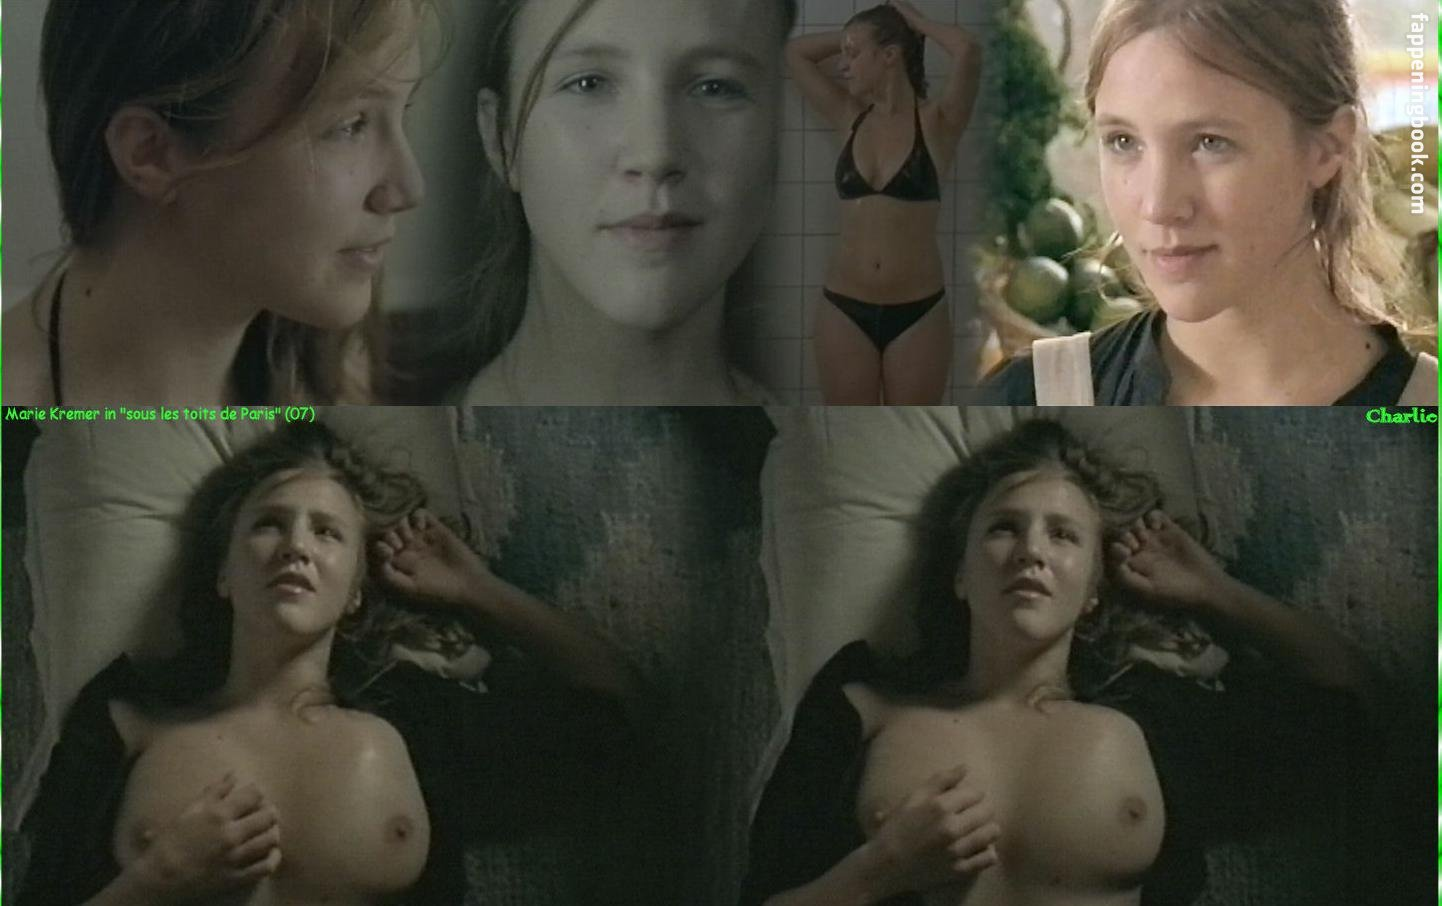 Marie Kremer Nude